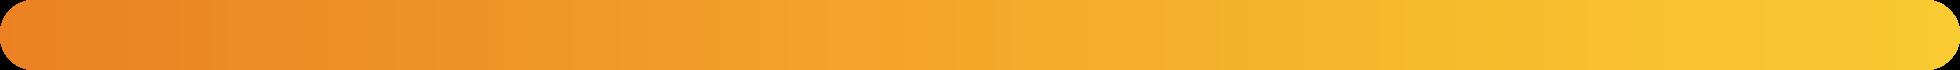 Sativa - Invigorate -CBD Hemp Strain Collection